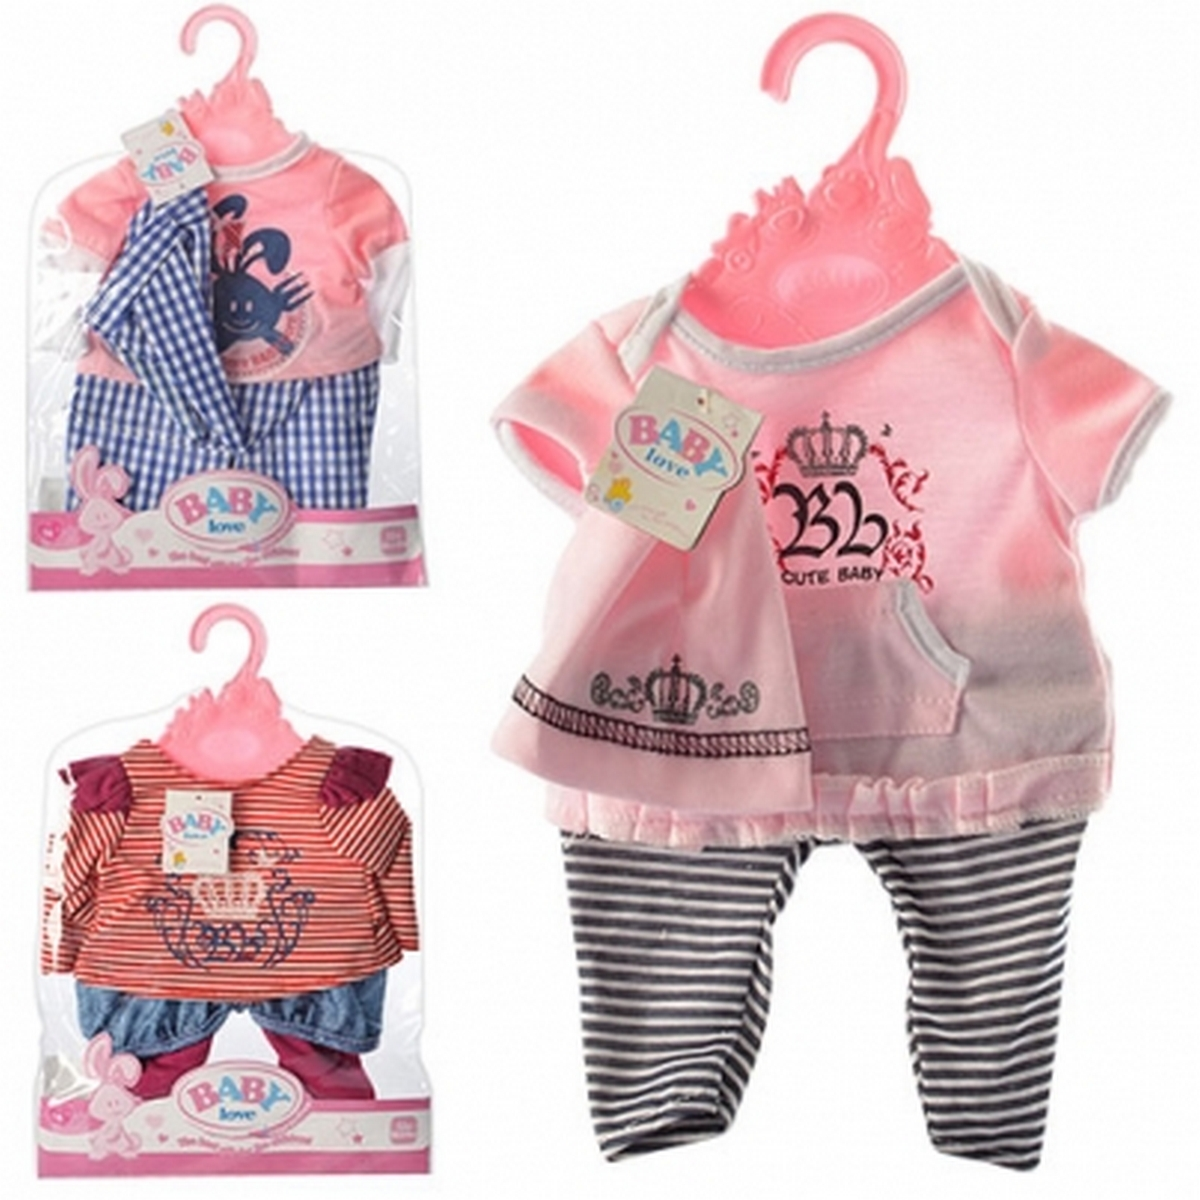 baby doll Одежда для пупса 3 вида BLC14-08-02